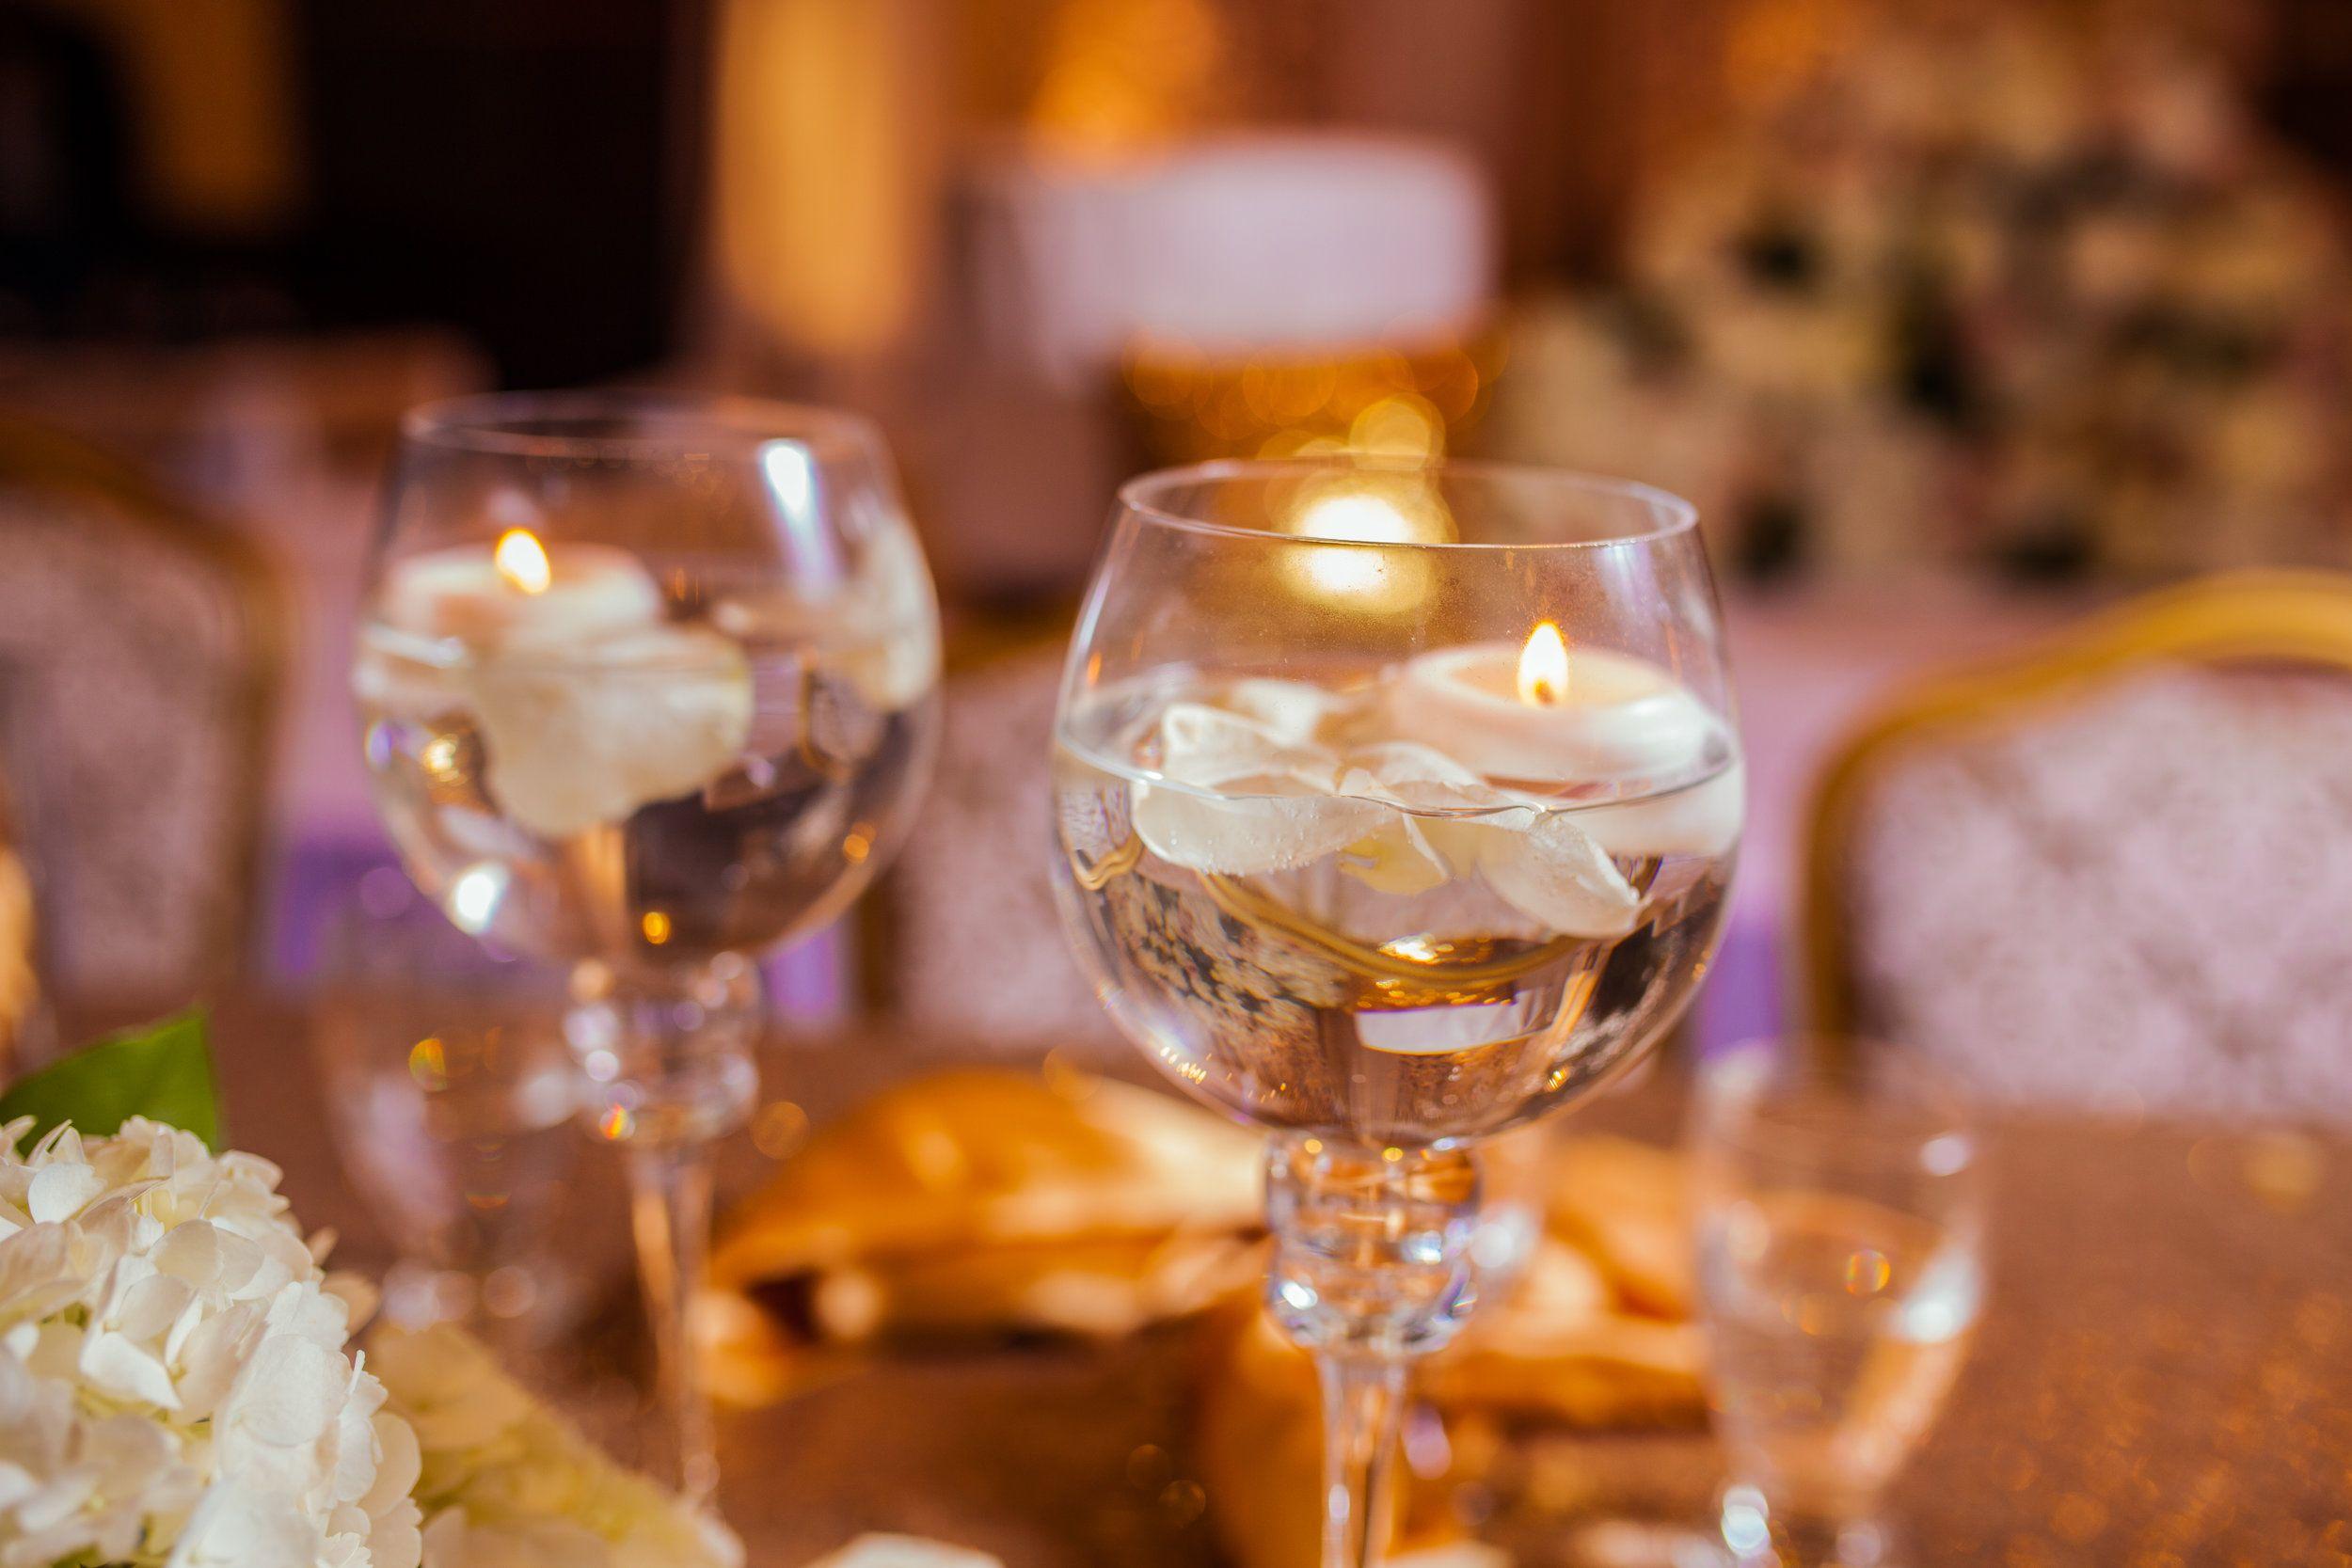 Karimah Gheddai Somali Weddings Toronto Florals Wedding Decor White